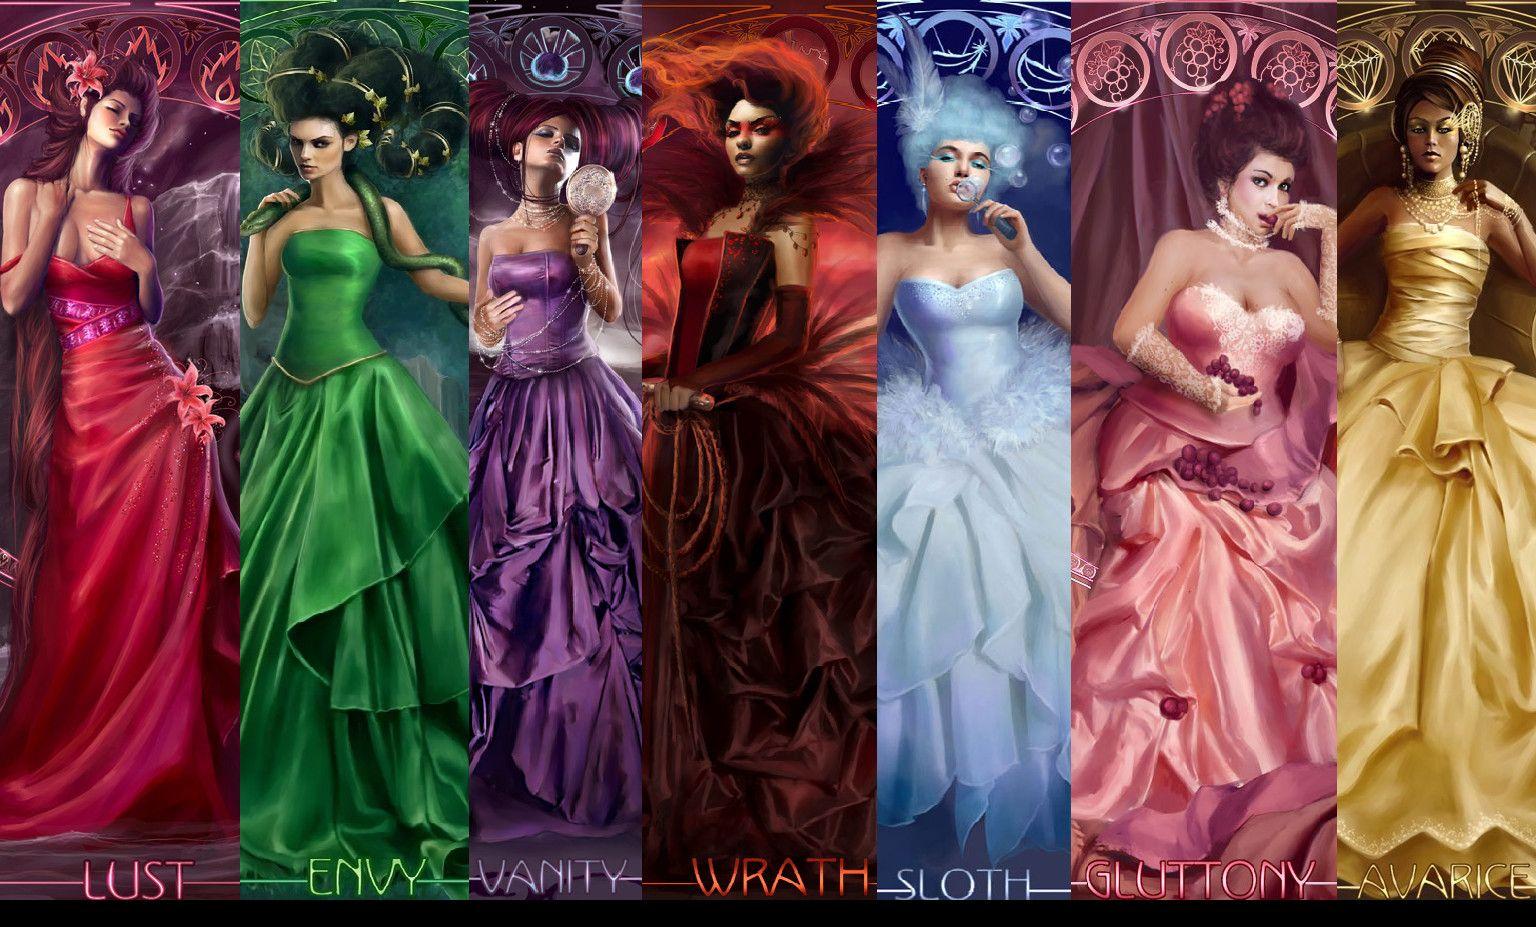 7 Deadly Houseguests Seven Deadly Sins Fantasy Girl Seven